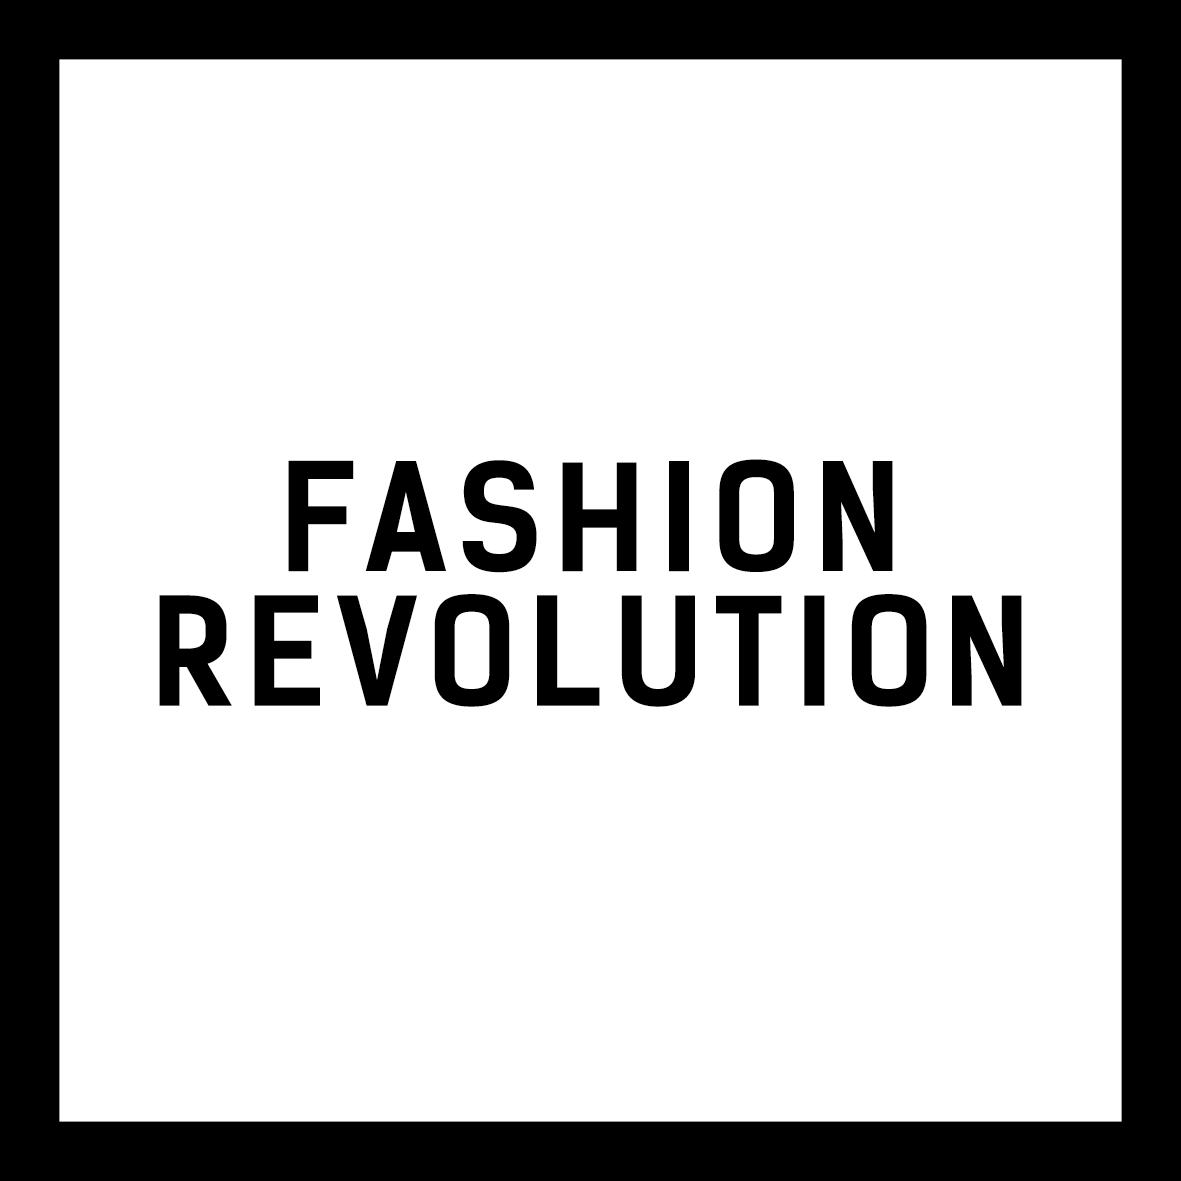 Logo for Fashion Revolution